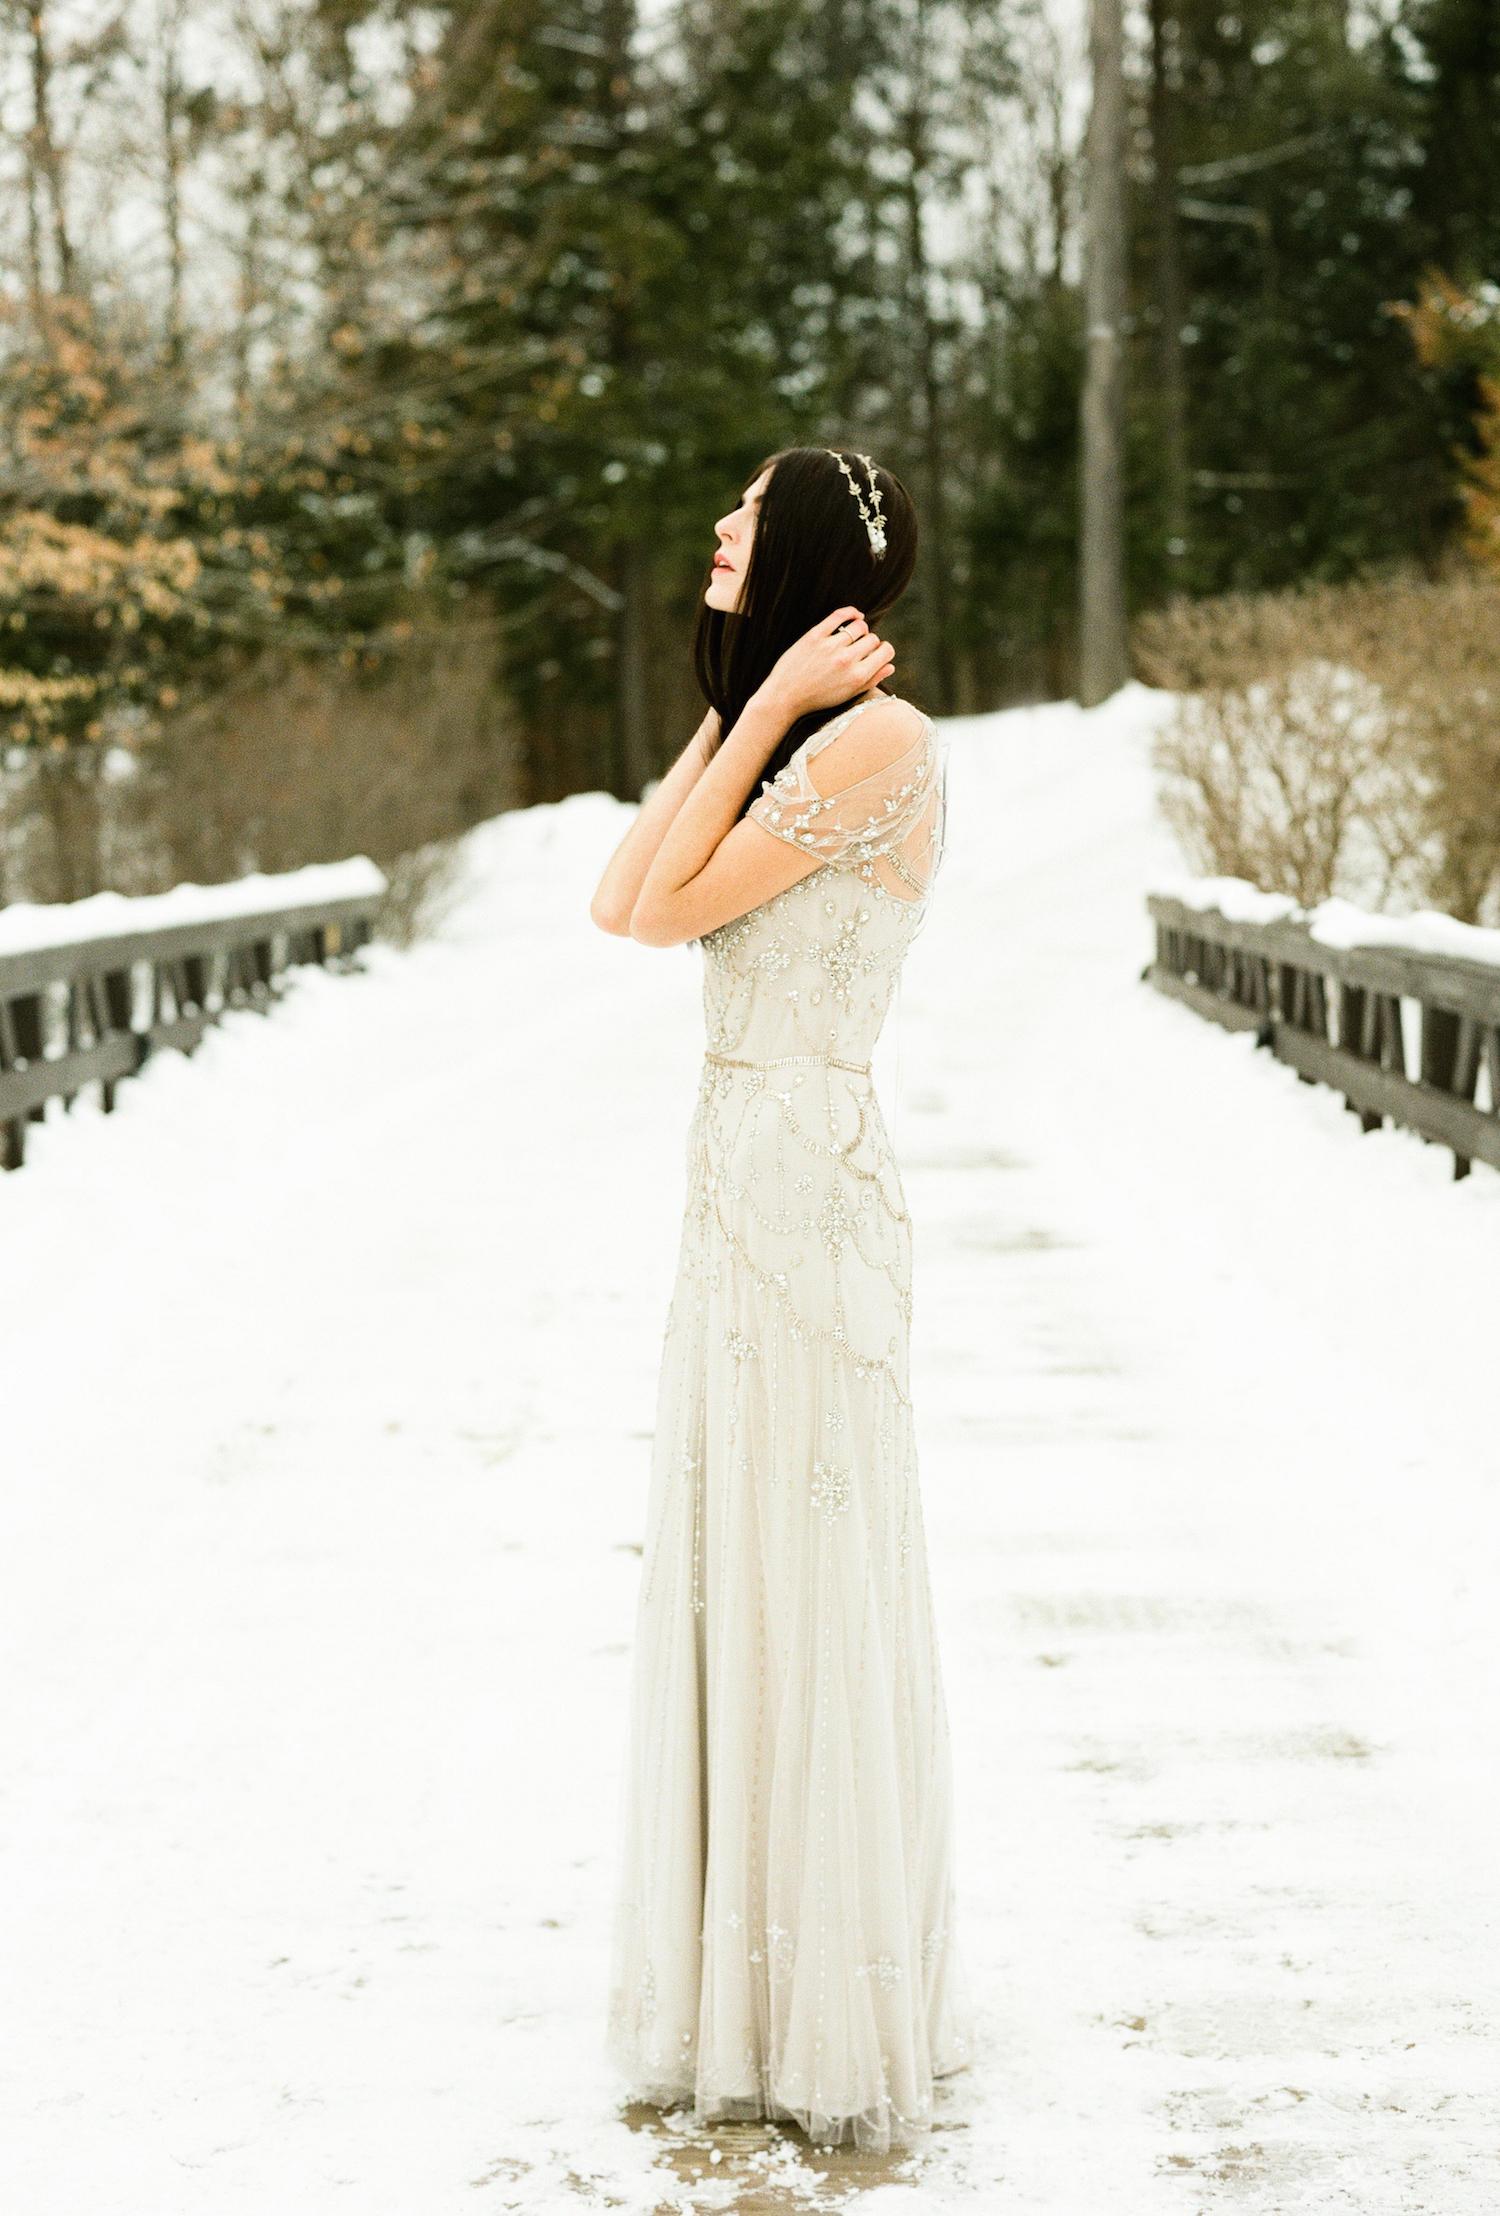 Winter Editorial-JennyPackham-LindsayMaddenPhotography-30 copy.jpg